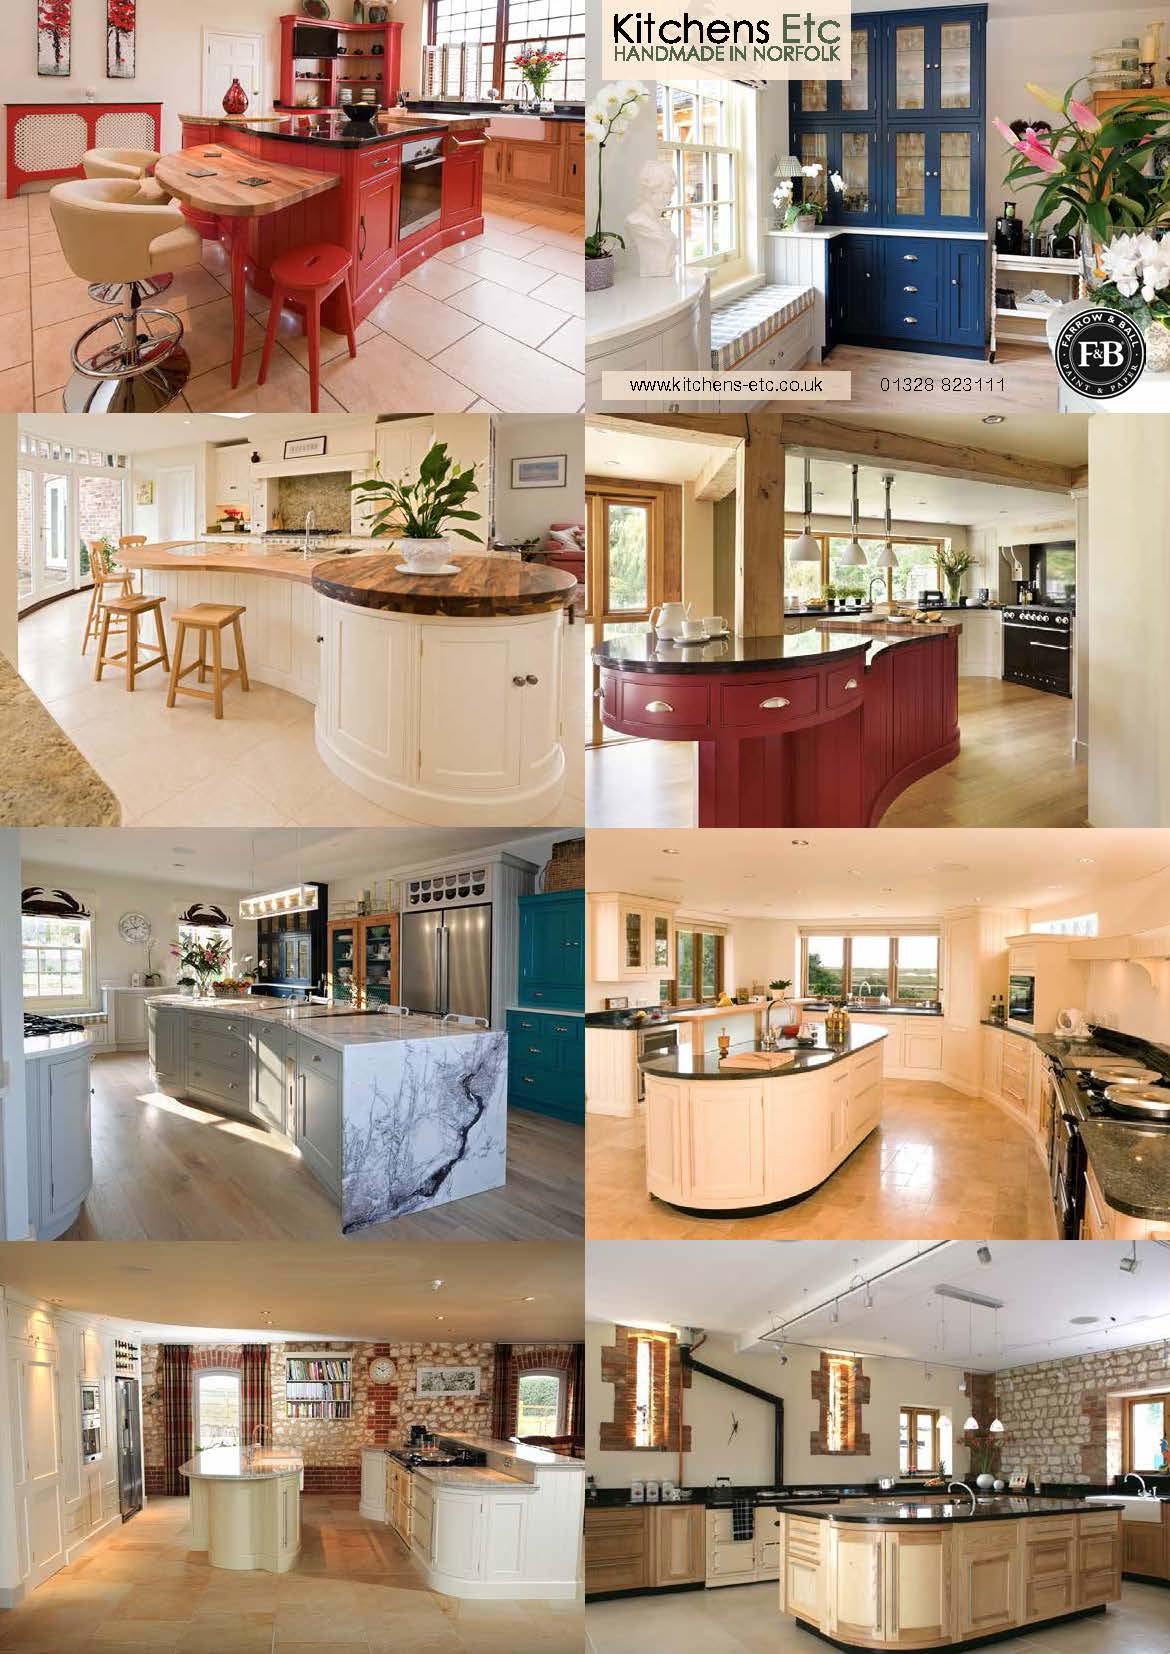 Kitchens Etc – brochure